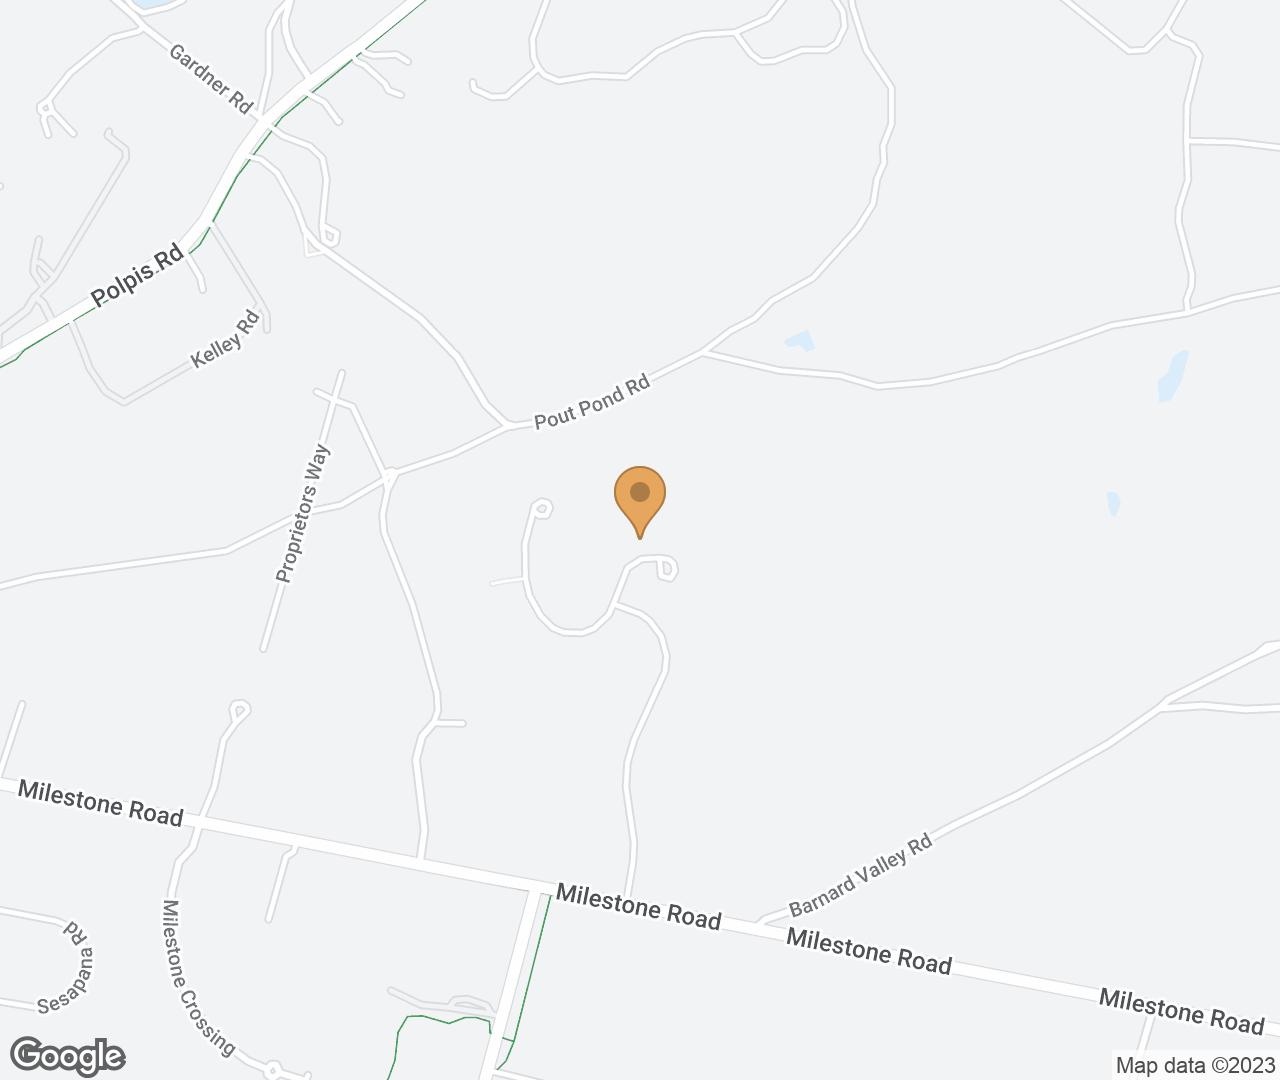 Google Map of 11 Upper Tawpawshaw Road, Nantucket, MA, USA